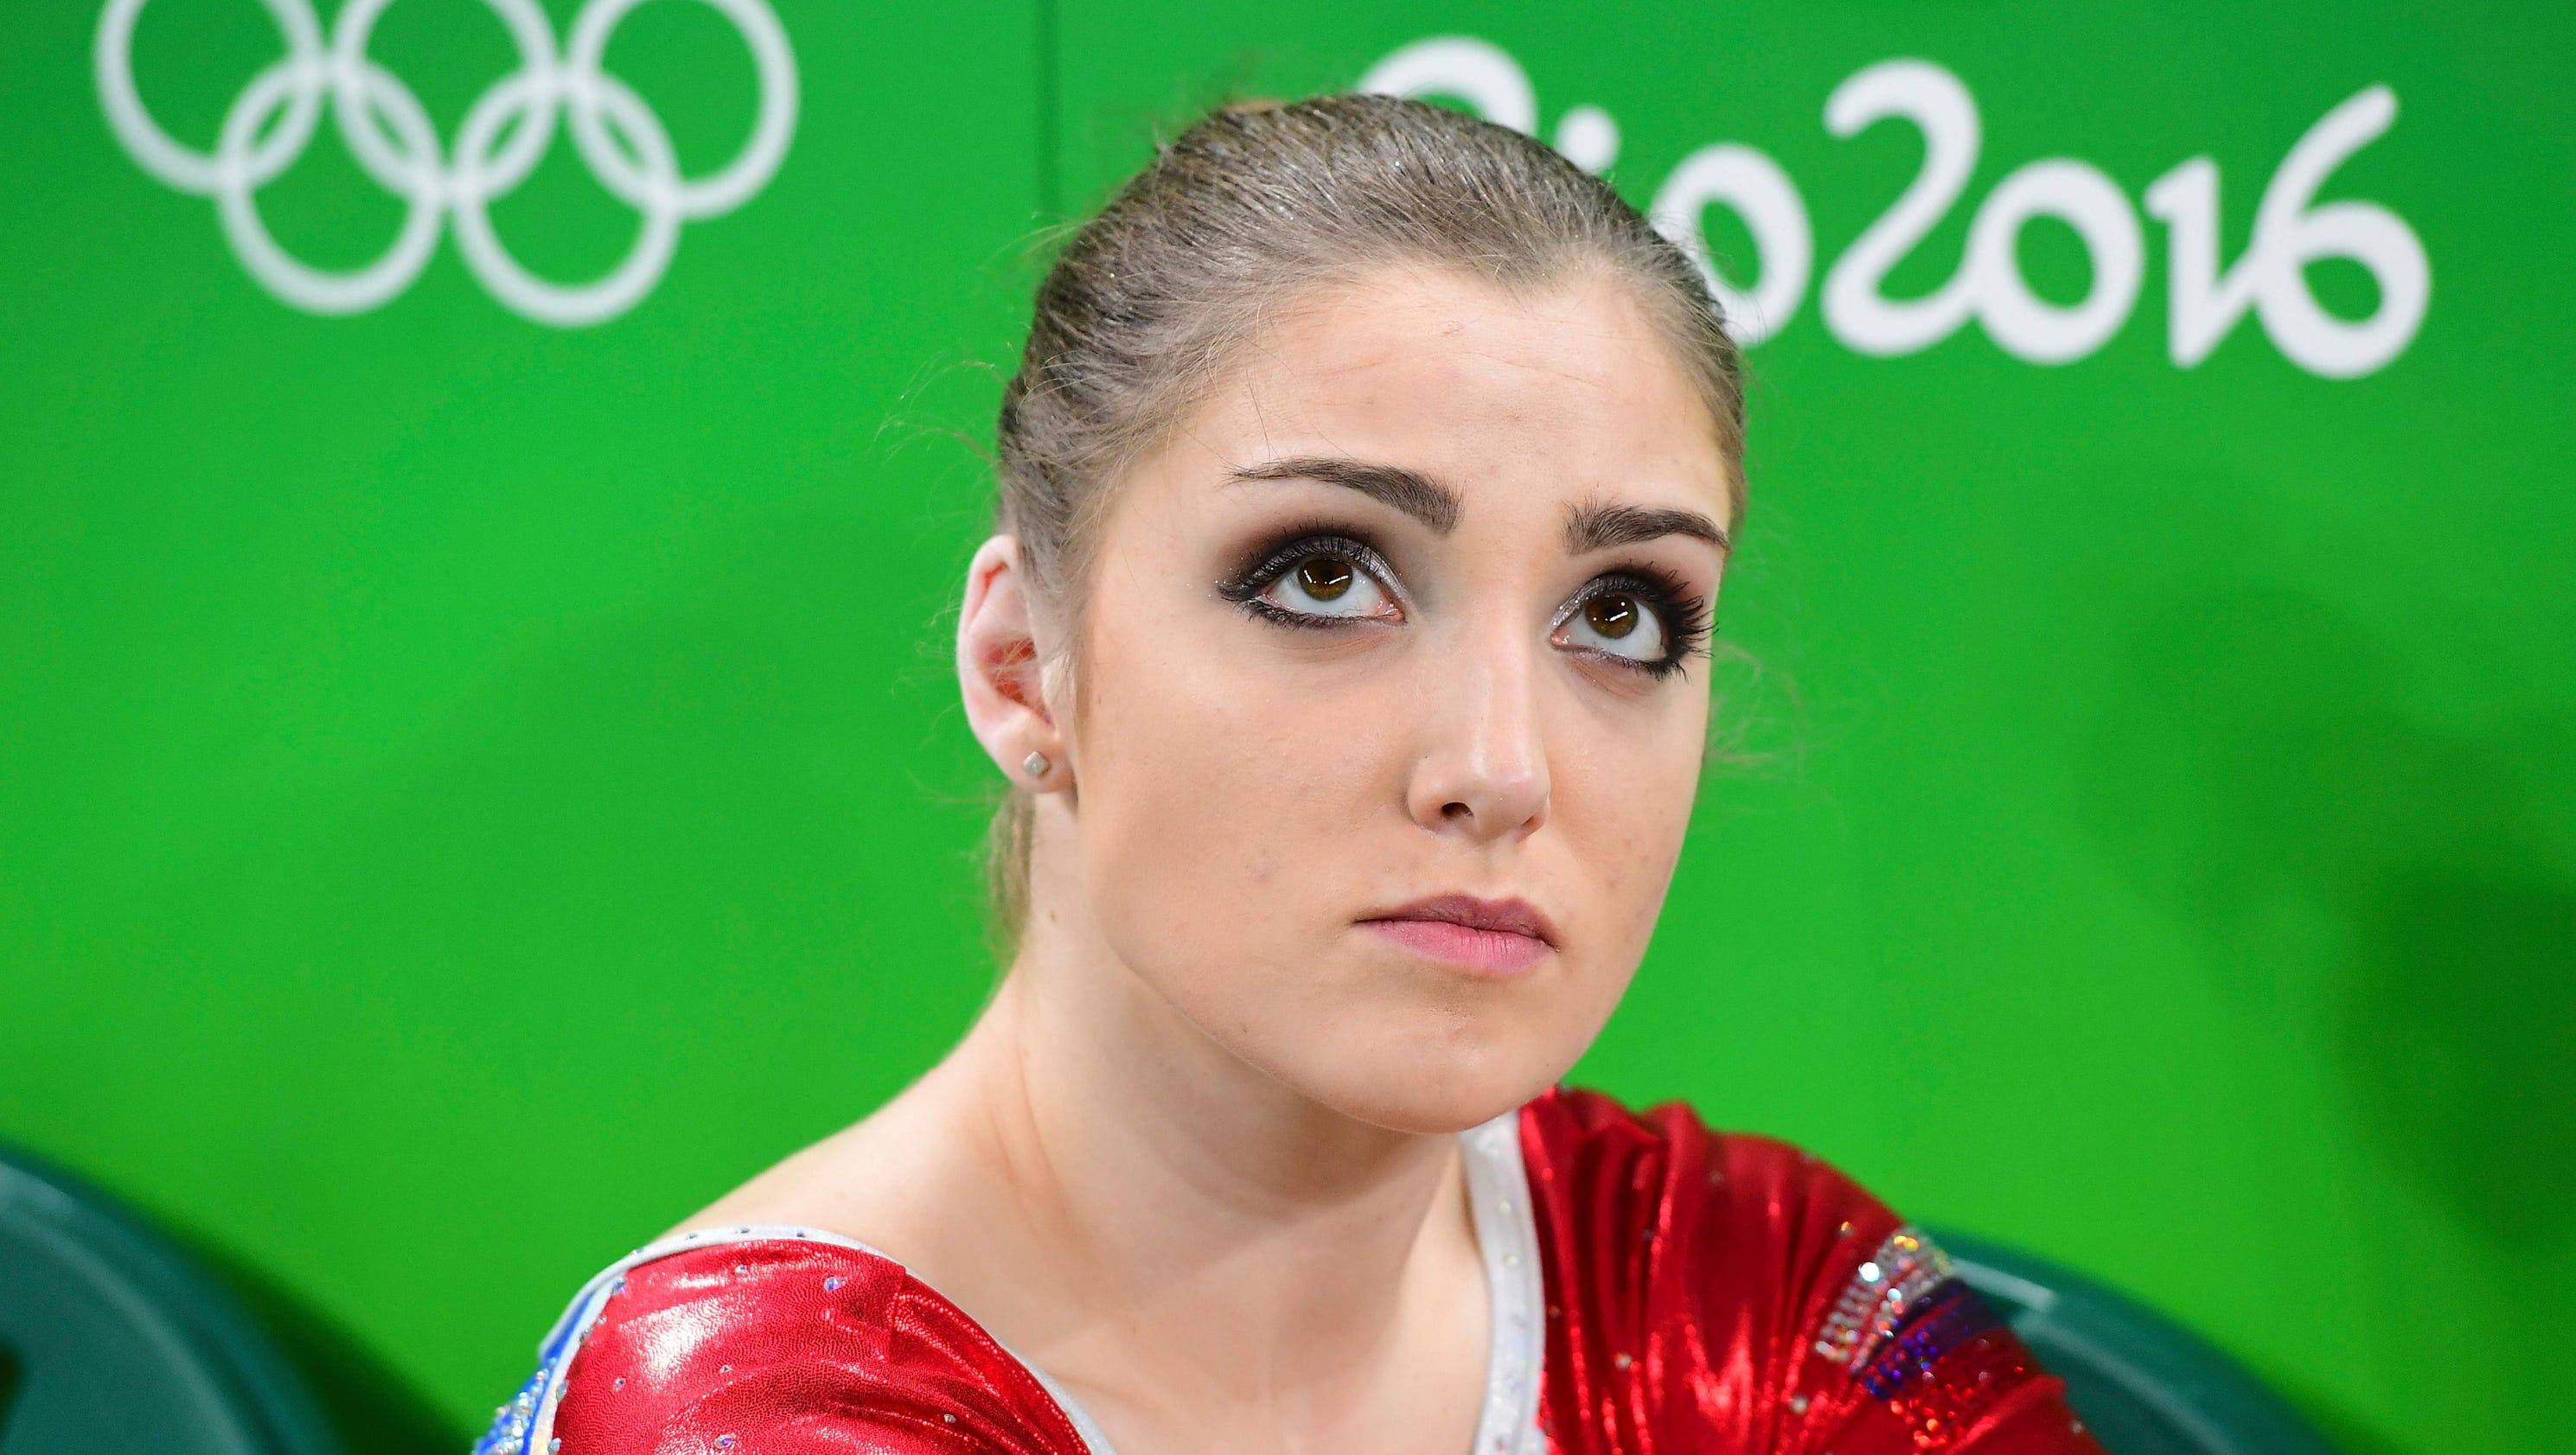 Russian Gymnast Aliya Mustafina Says Doping Crisis Not A